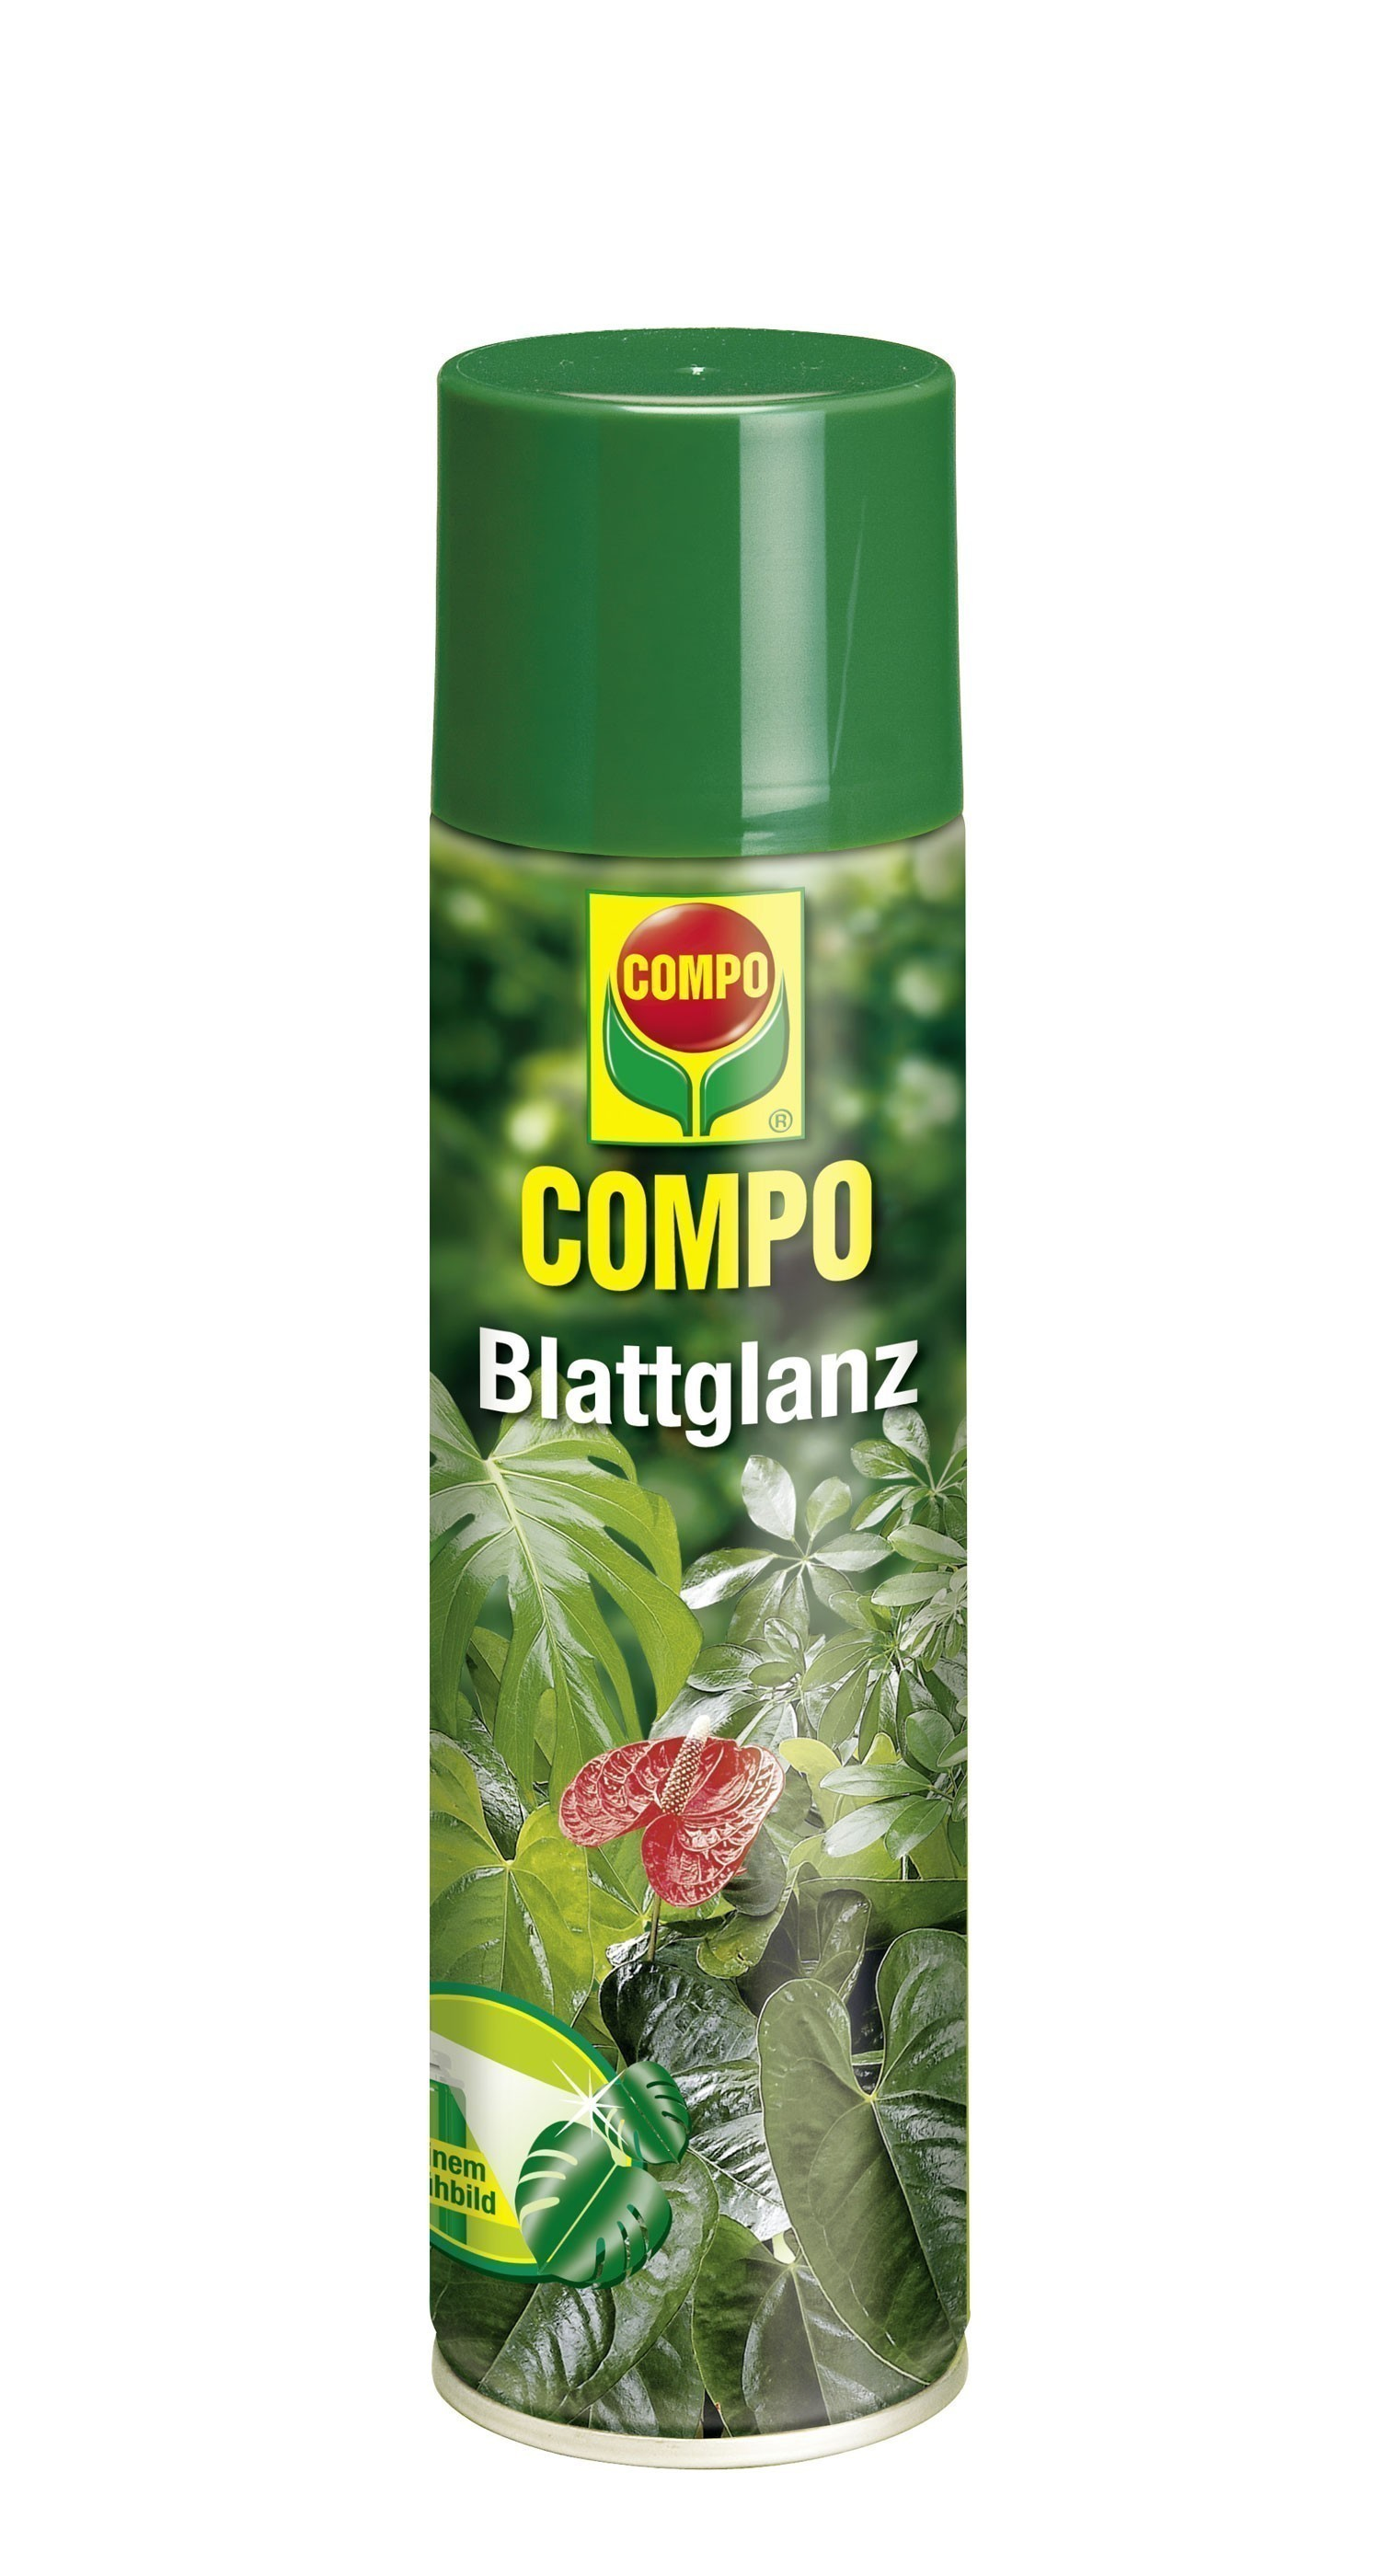 COMPO Blattglanz 300ml Bild 1